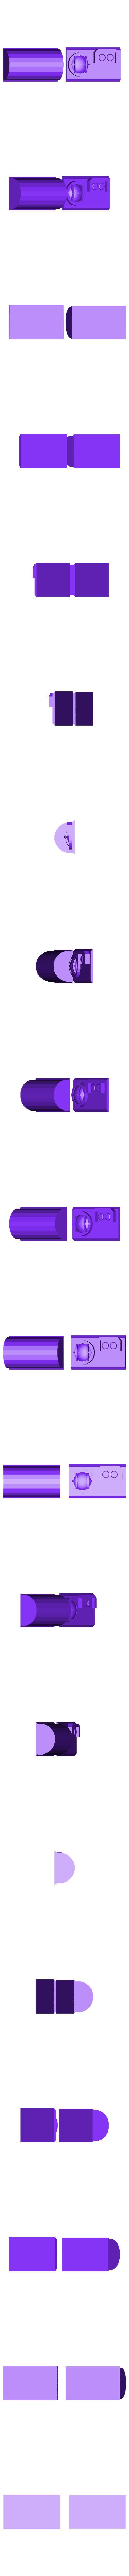 Body_Light_and_Sensor_array.stl Download free STL file Interstellar Army - Quad Mortar and Quad Cannon • 3D printing model, Cikkirock